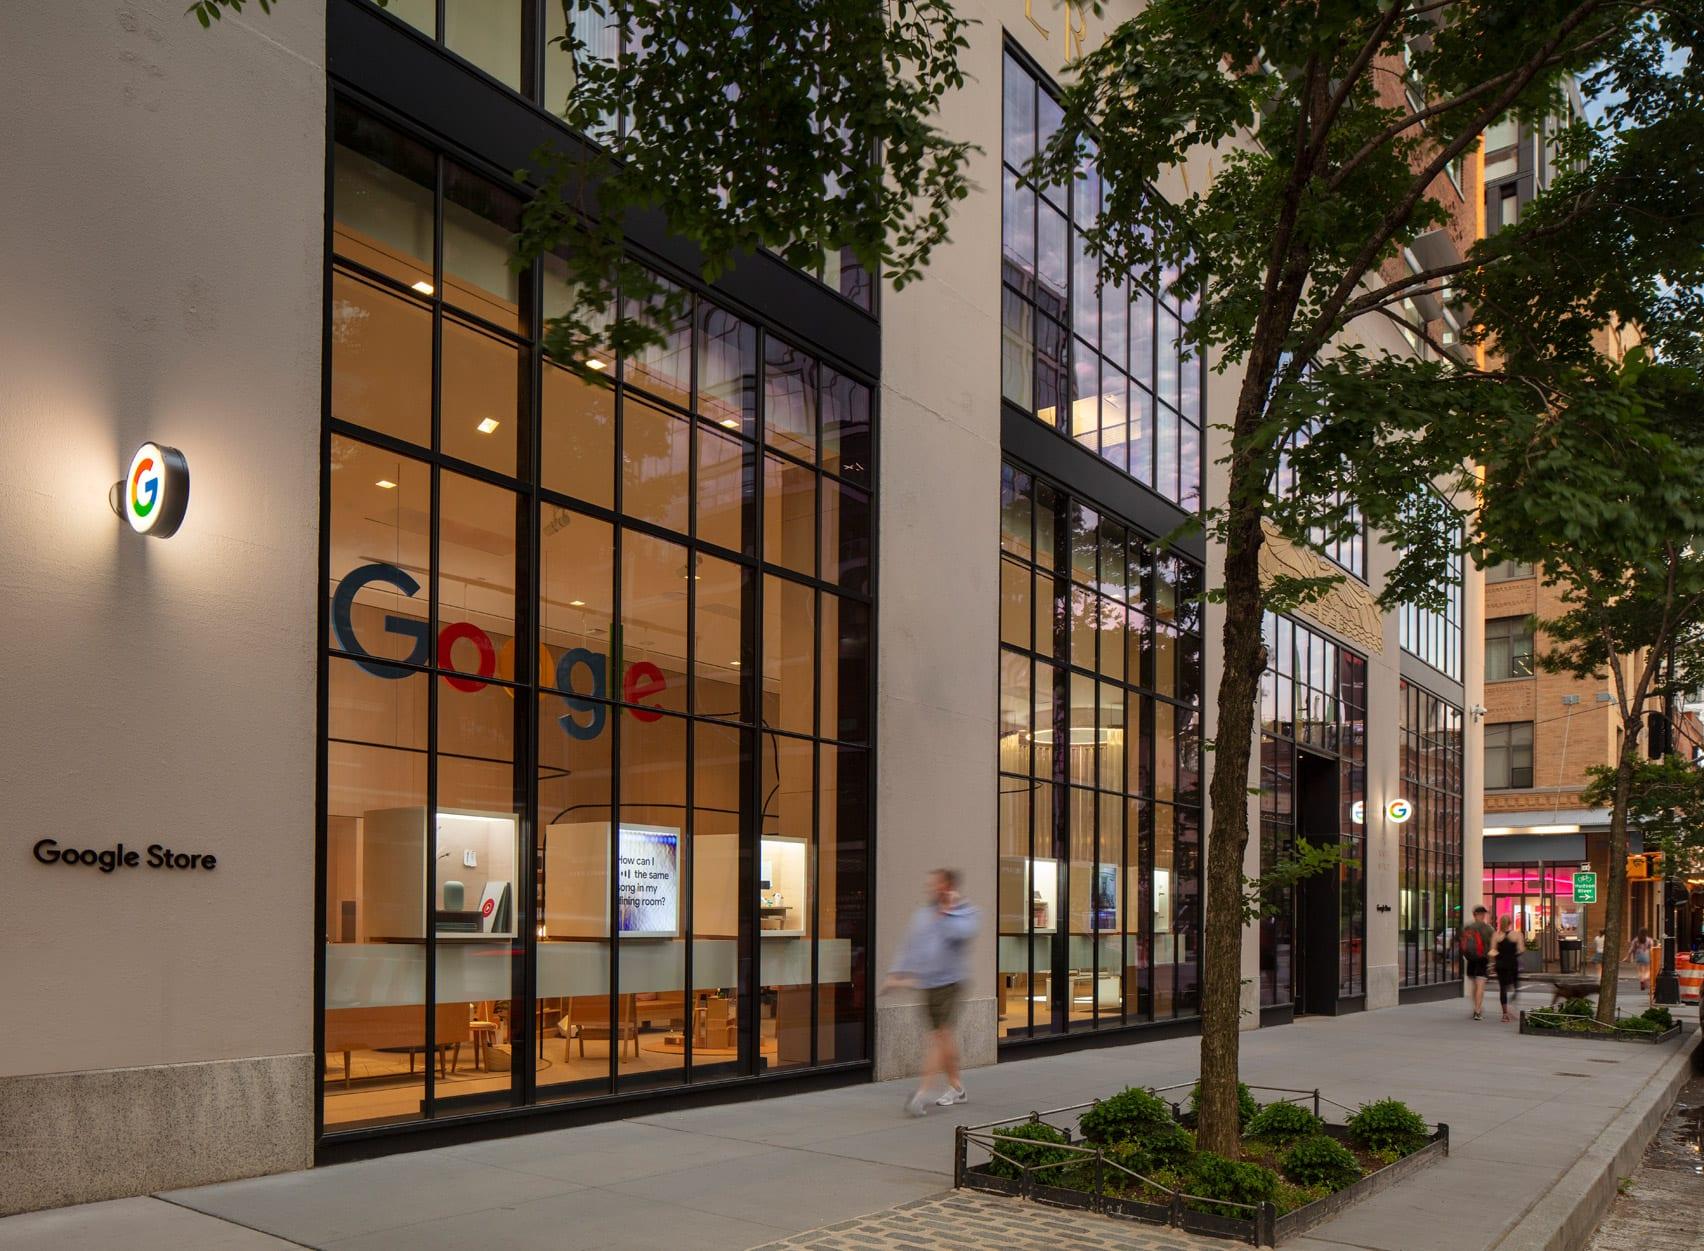 Google Store windows